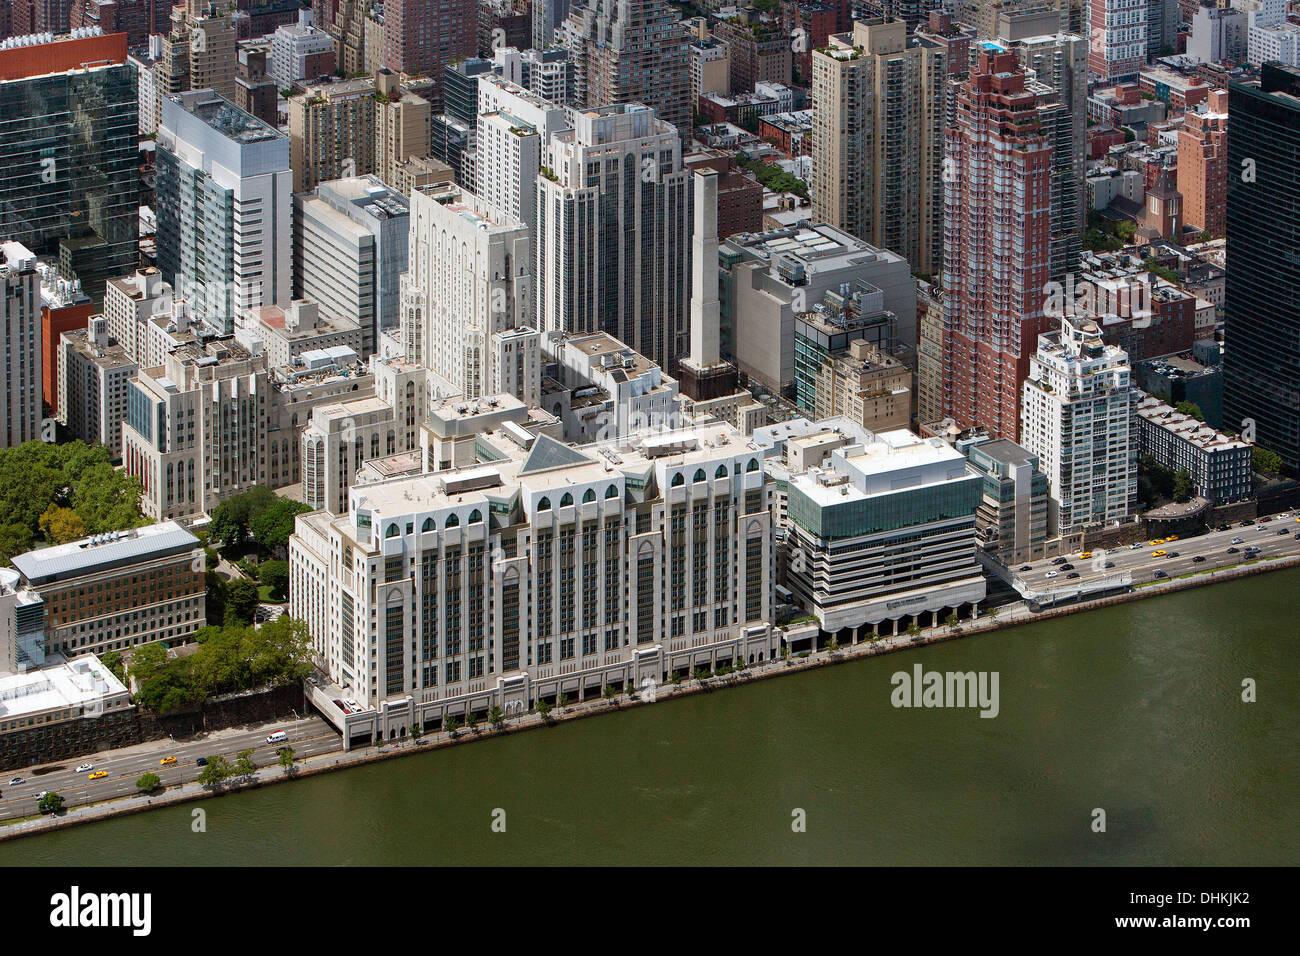 aerial photograph Hospital for Special Surgery, East River Esplanade, Manhattan, New York City - Stock Image